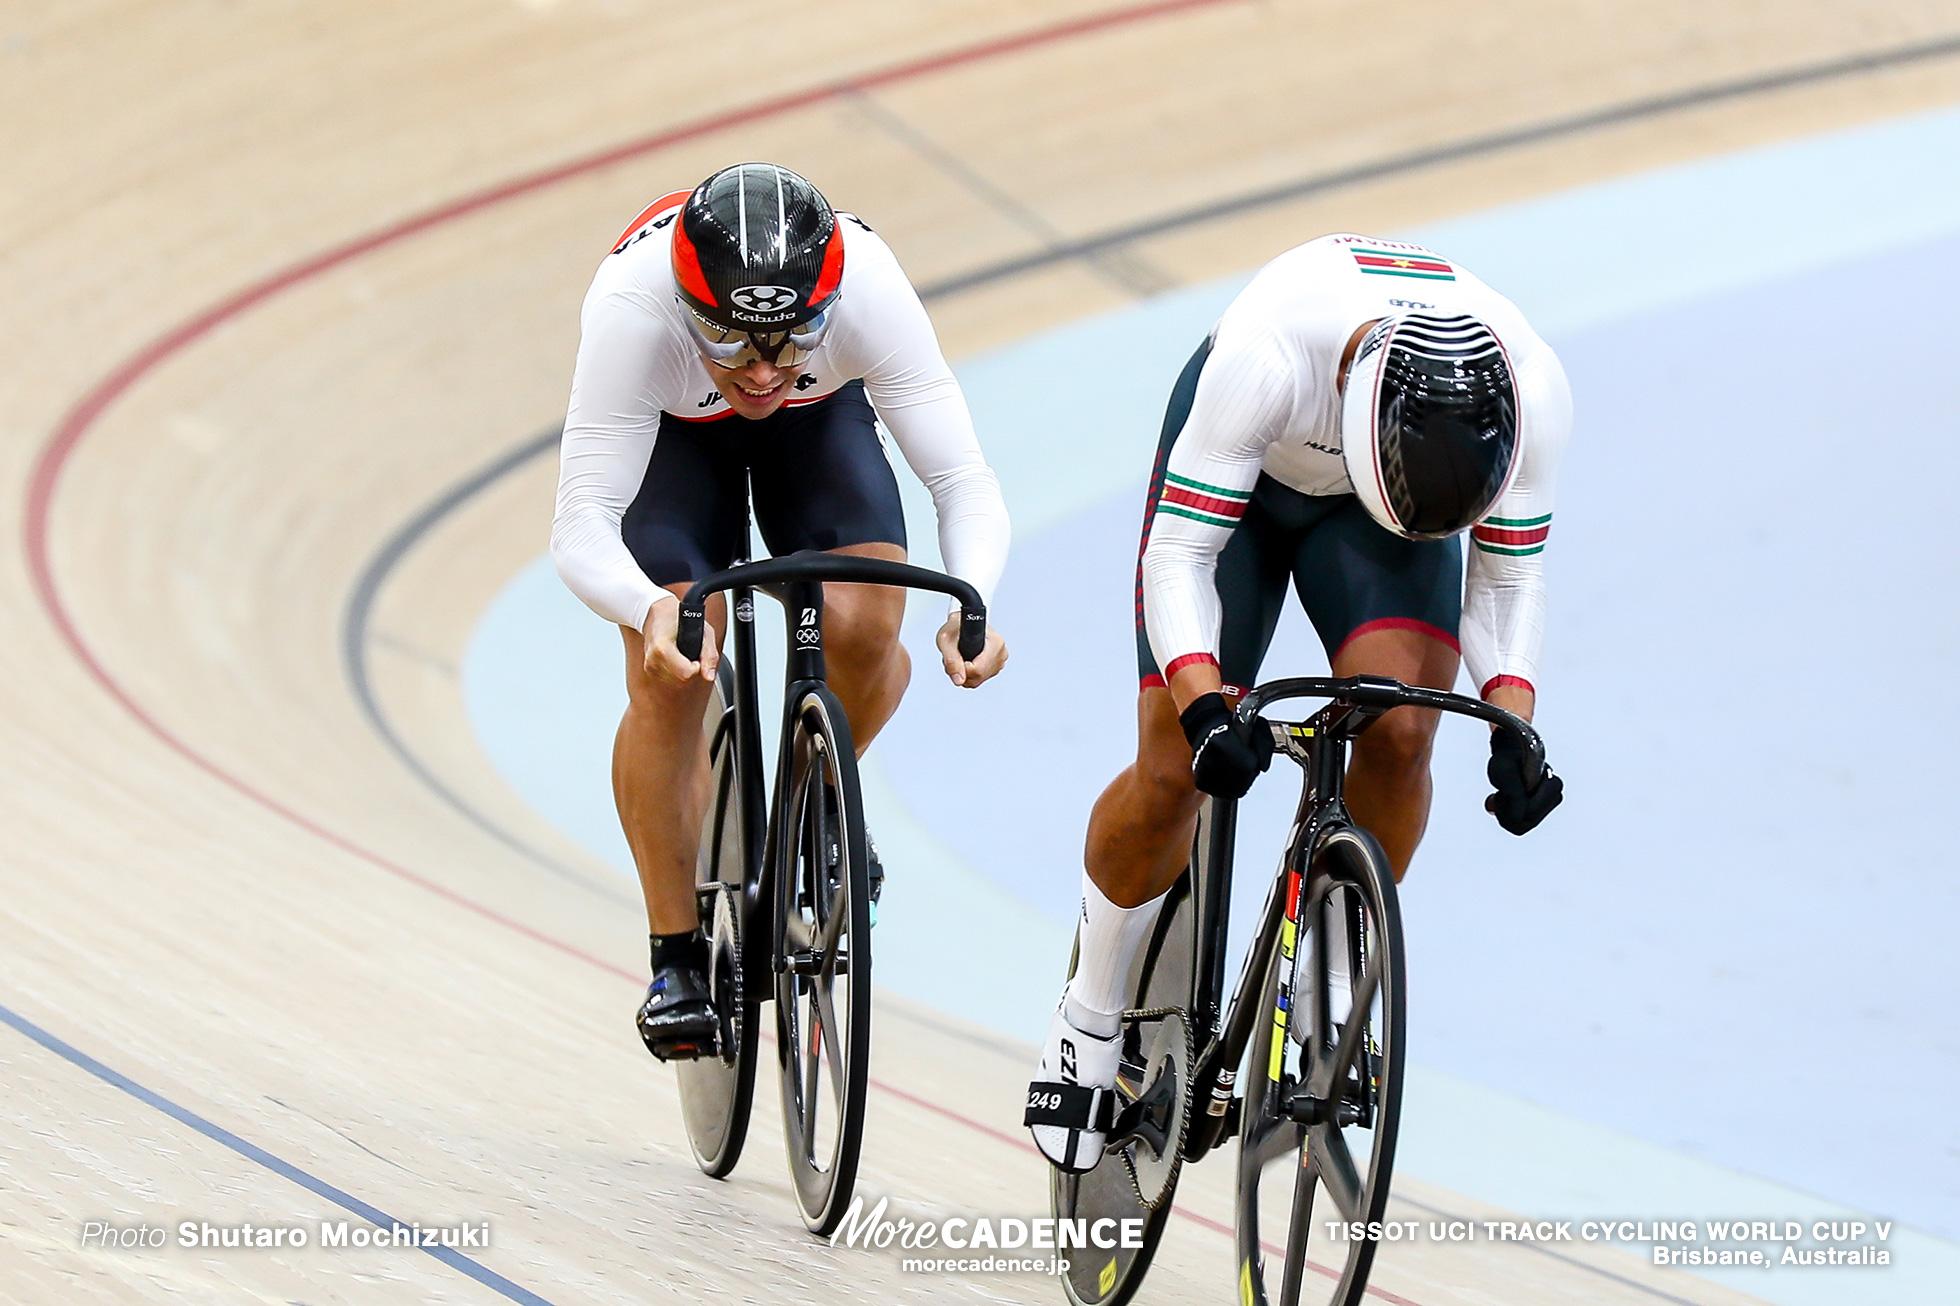 2nd Round / Men's Sprint / TISSOT UCI TRACK CYCLING WORLD CUP V, Brisbane, Australia